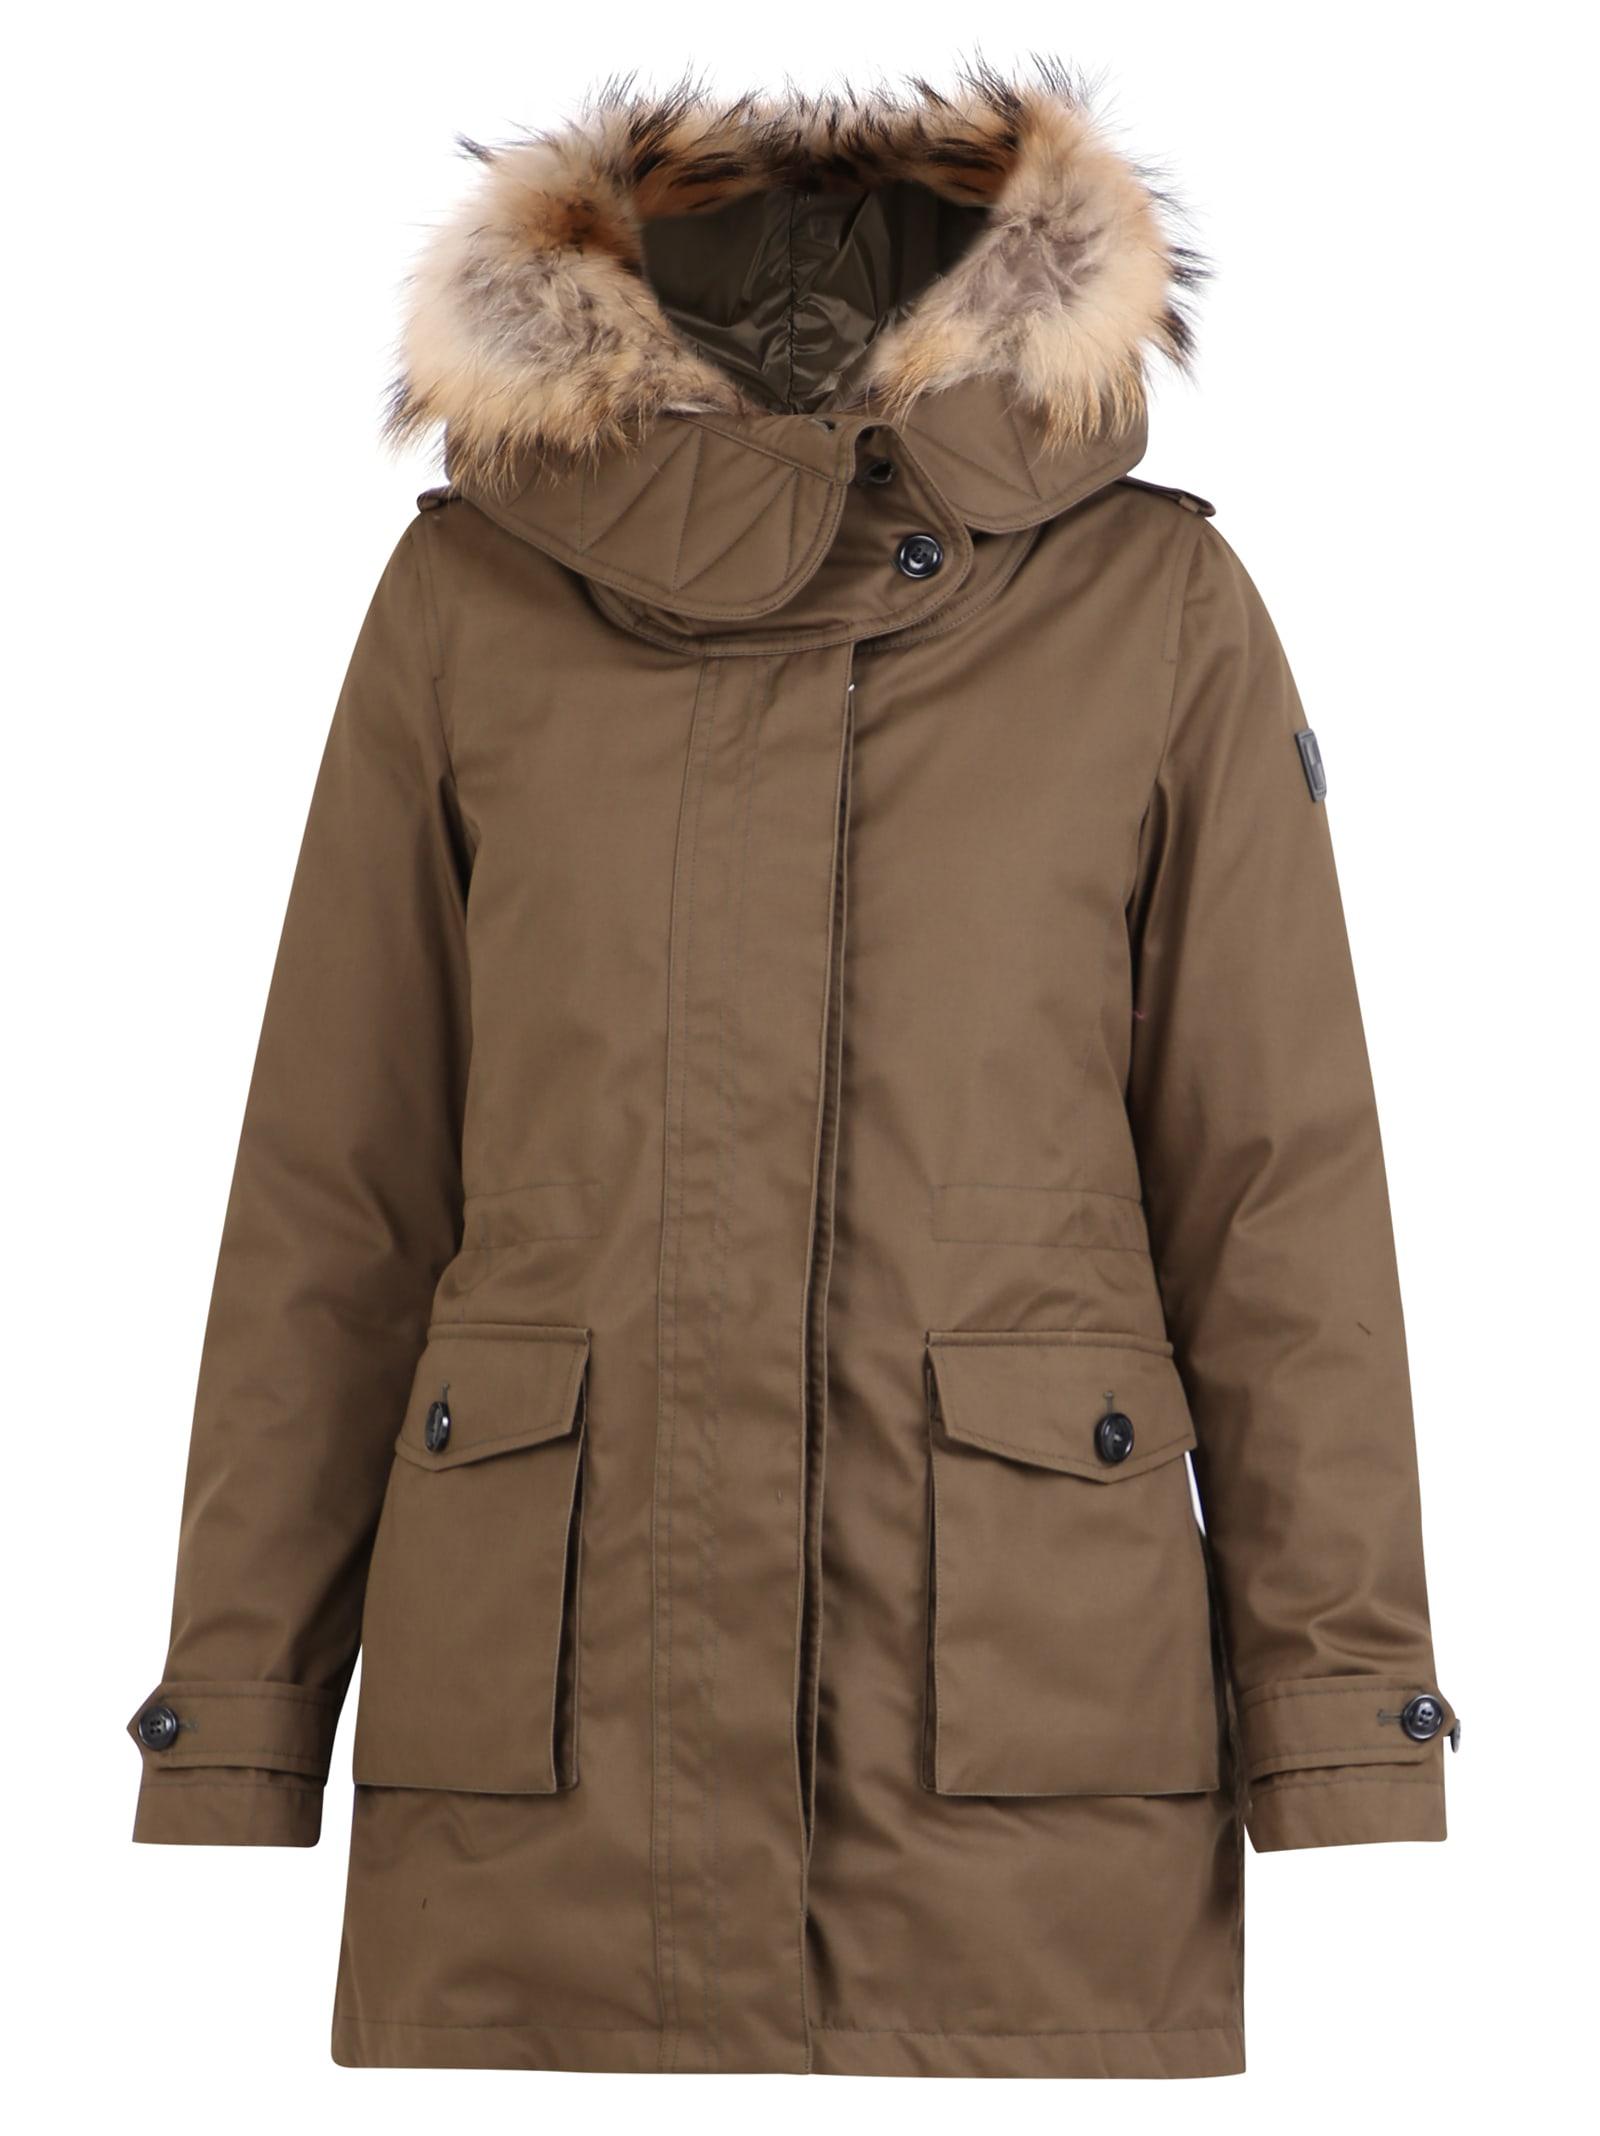 Woolrich Parka Coat